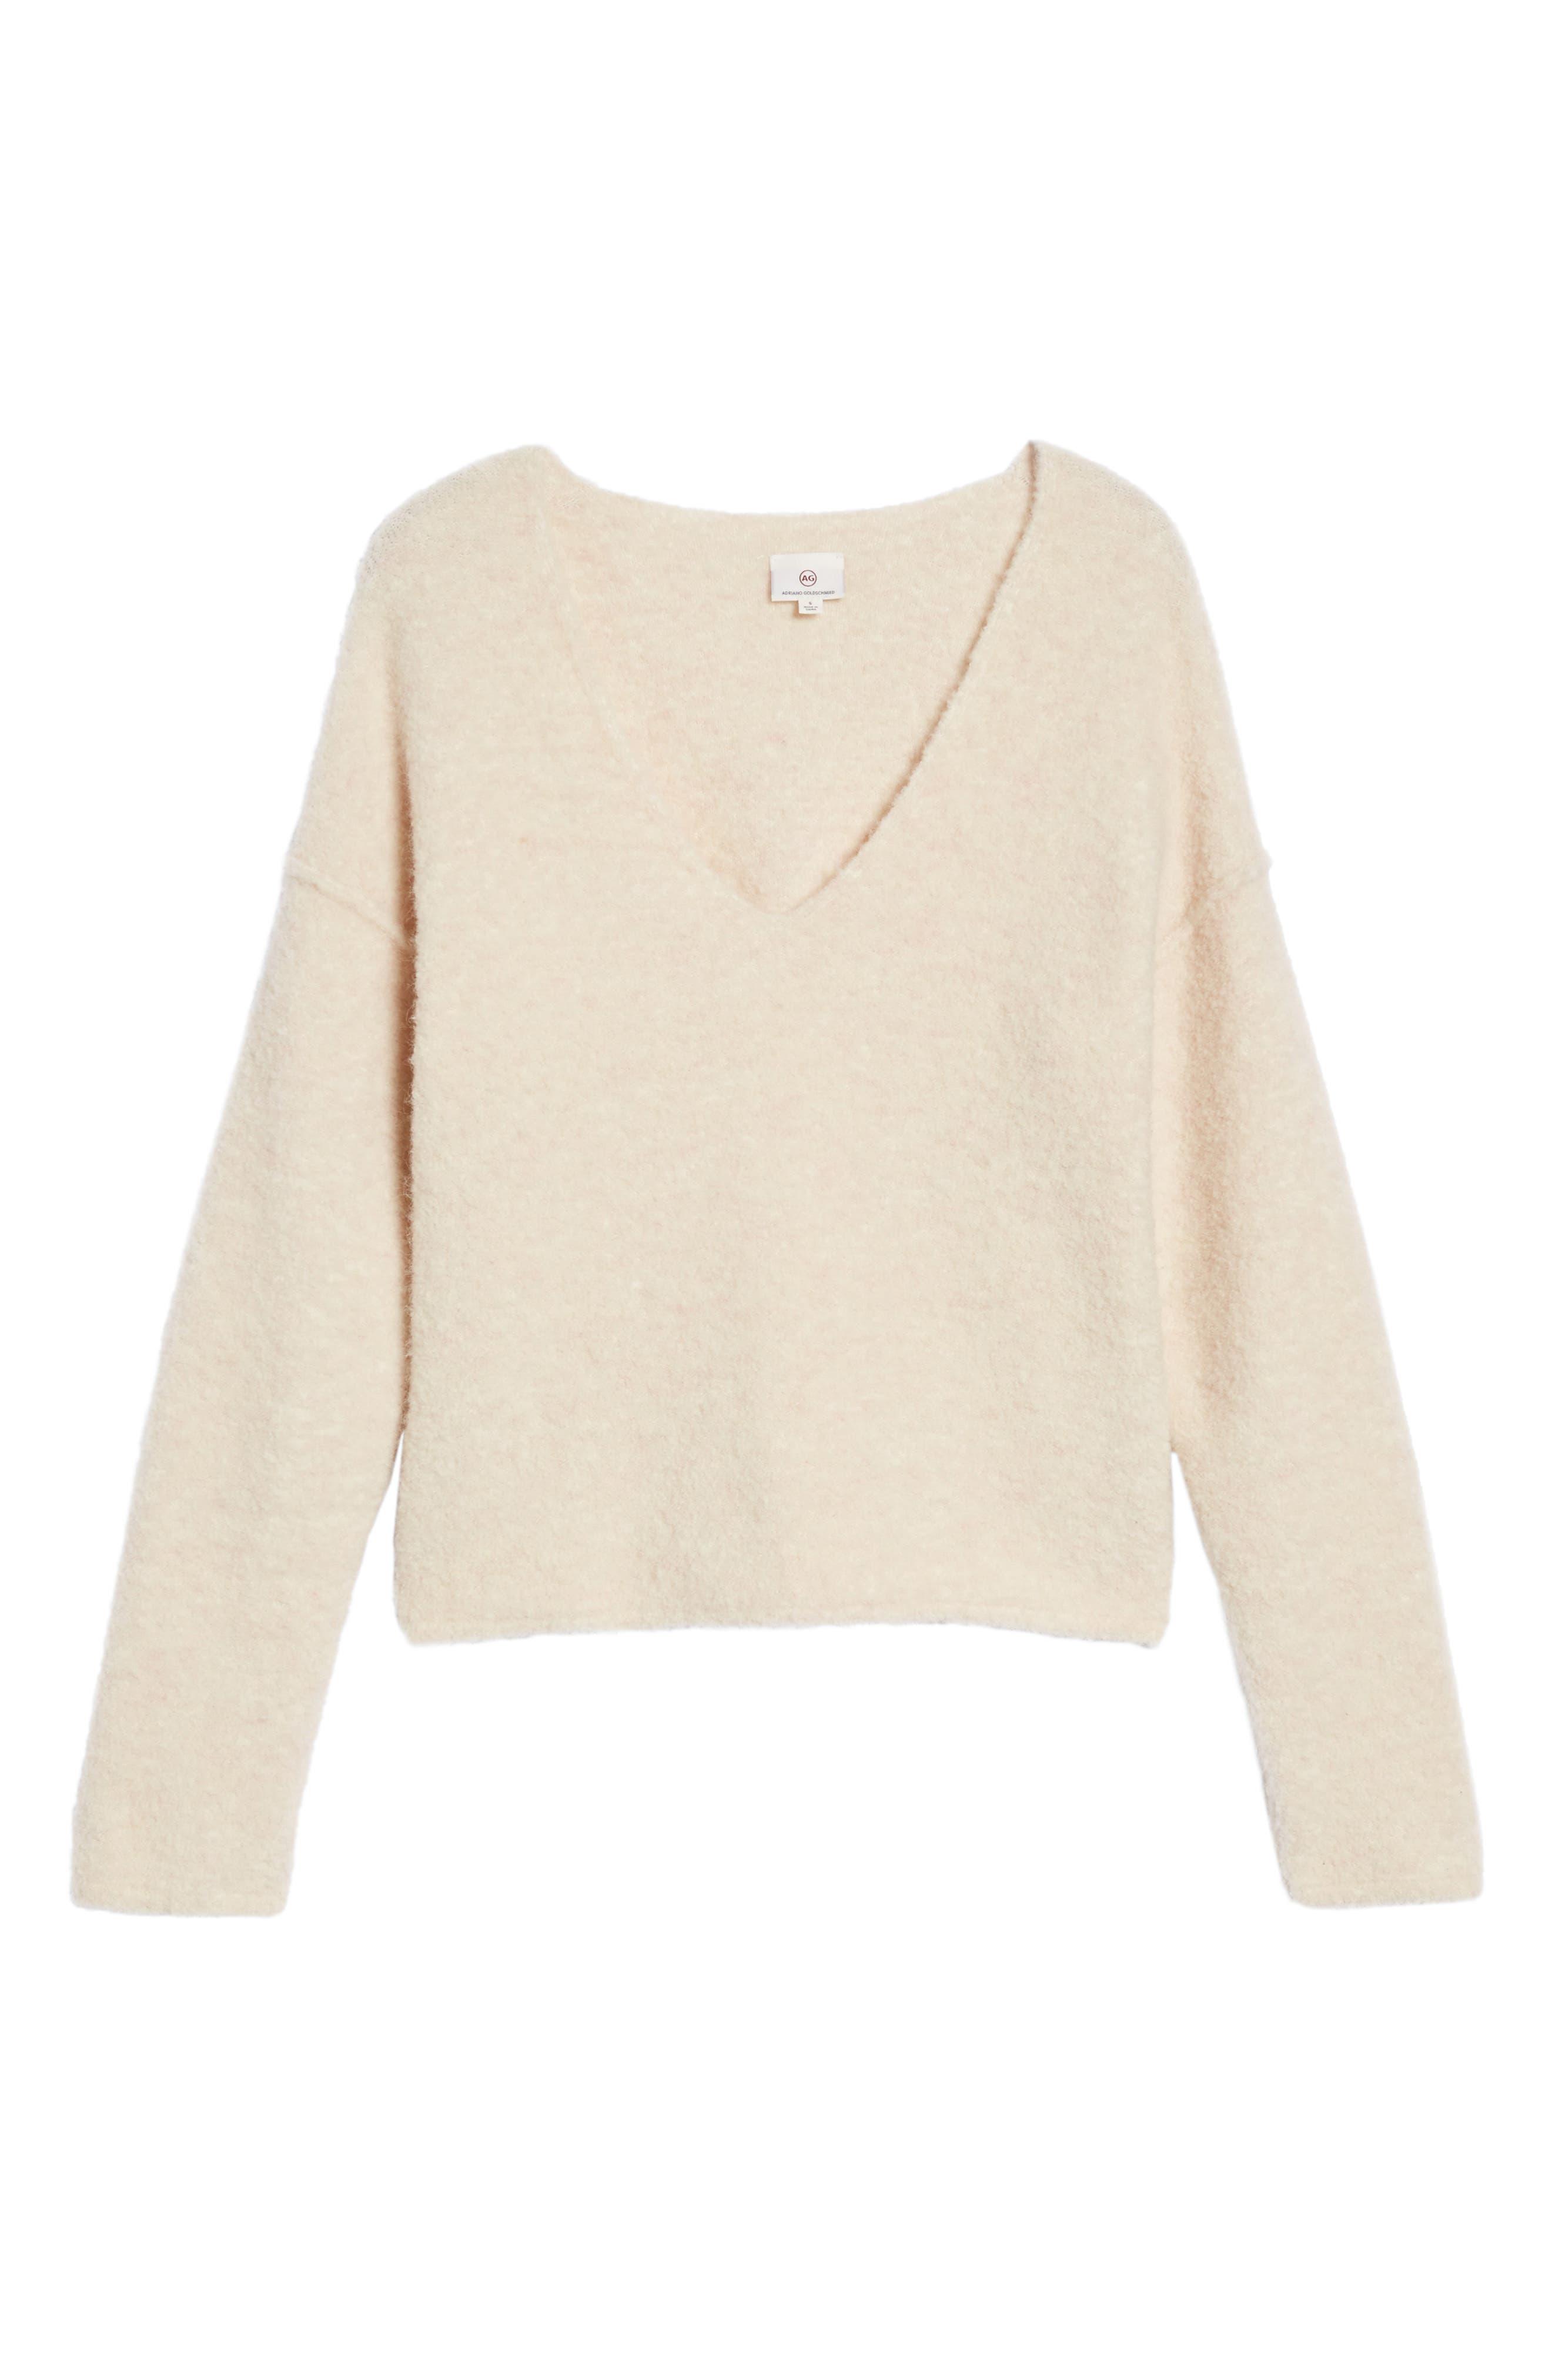 Skye Sweater,                             Alternate thumbnail 12, color,